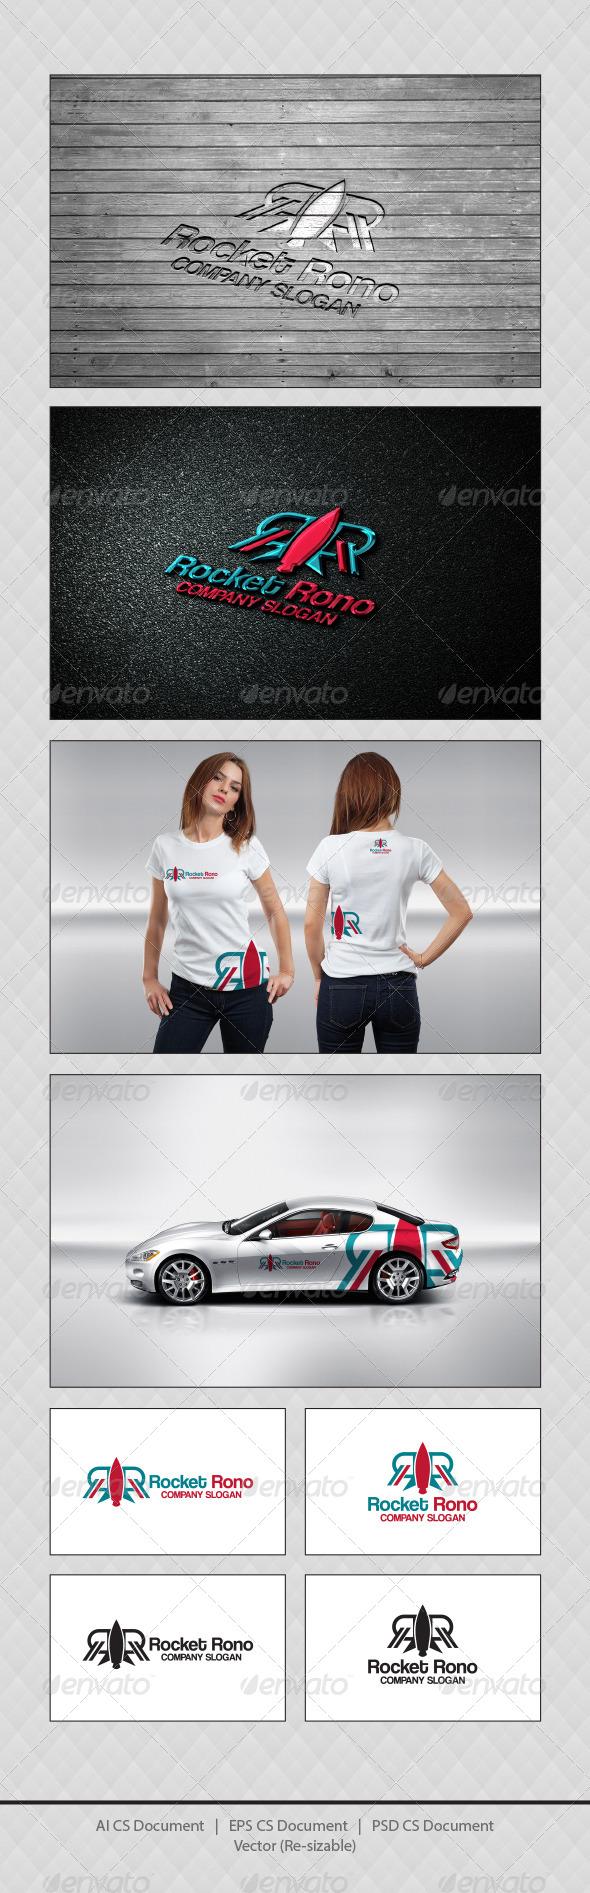 GraphicRiver Rocket Rono R Logo Templates 4560152